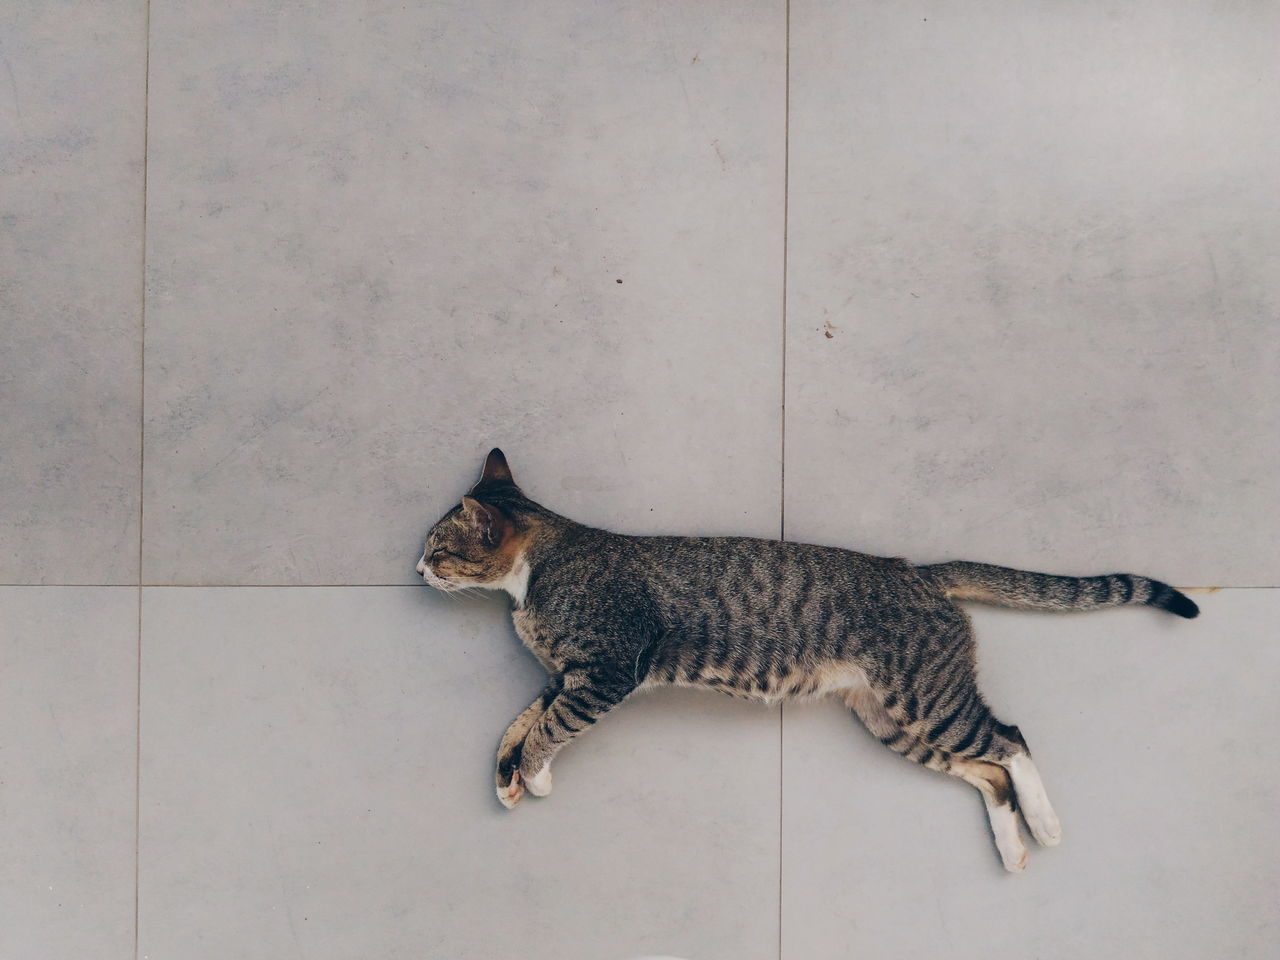 Cat Thailand Buriram  Noteo.m.g. Photo Cat